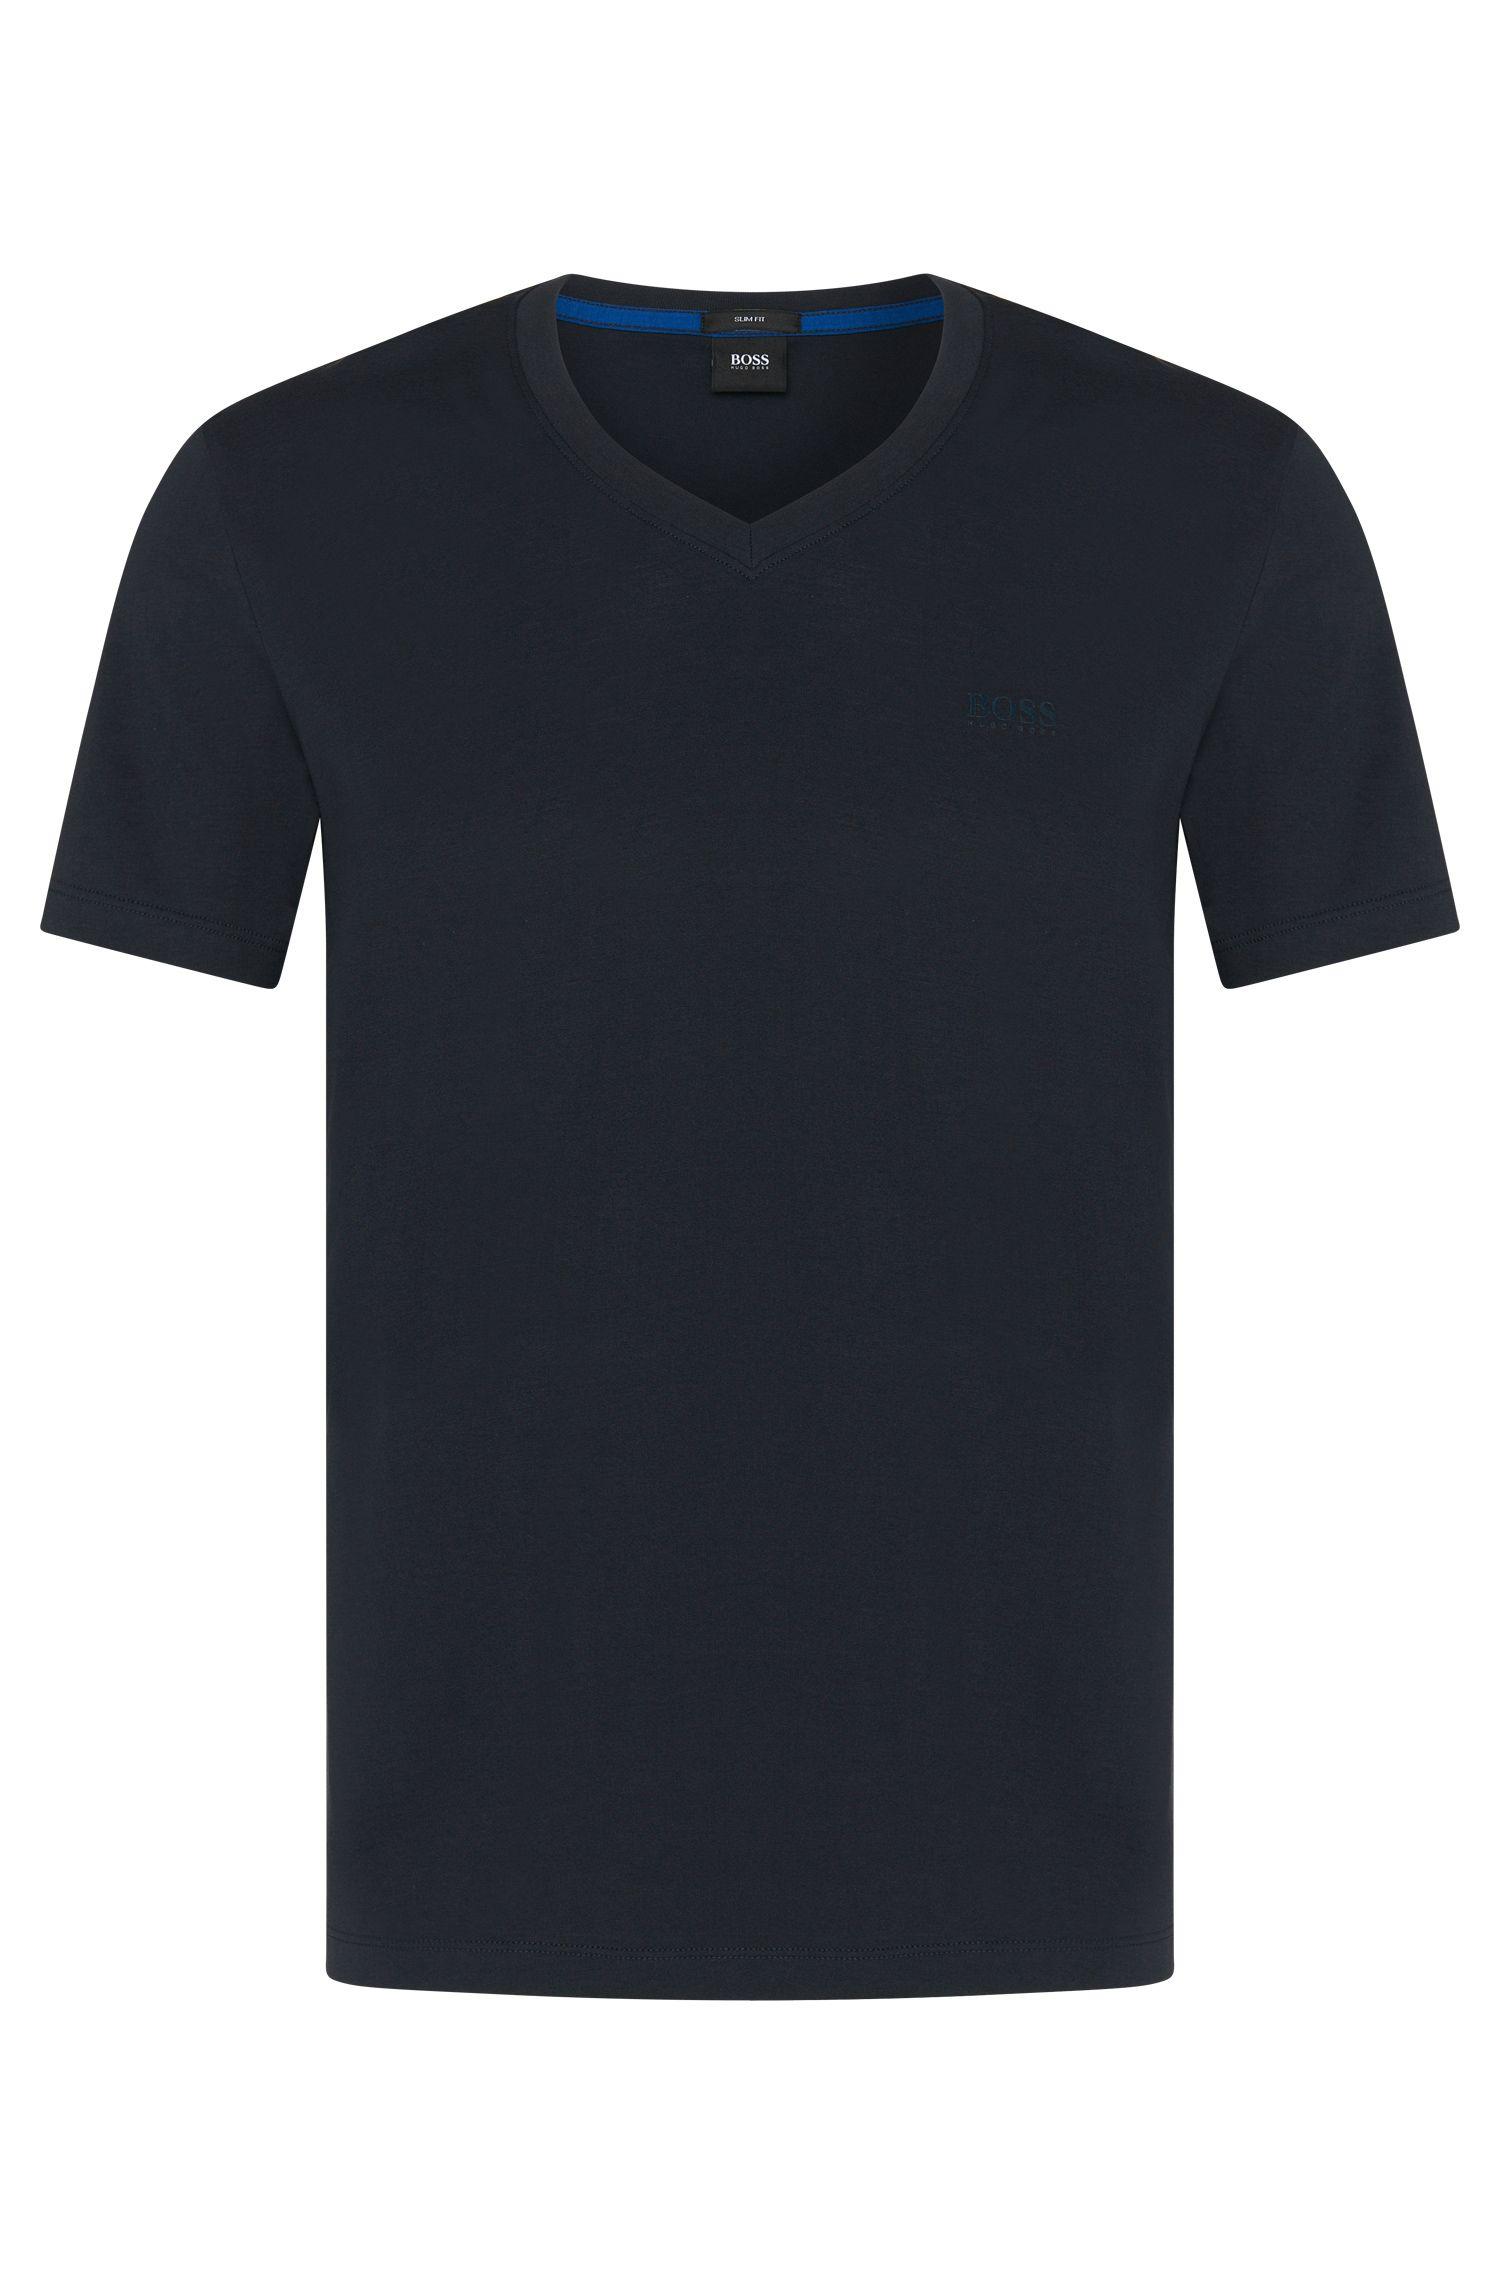 'Teal 11'   Cotton Melange T-Shirt